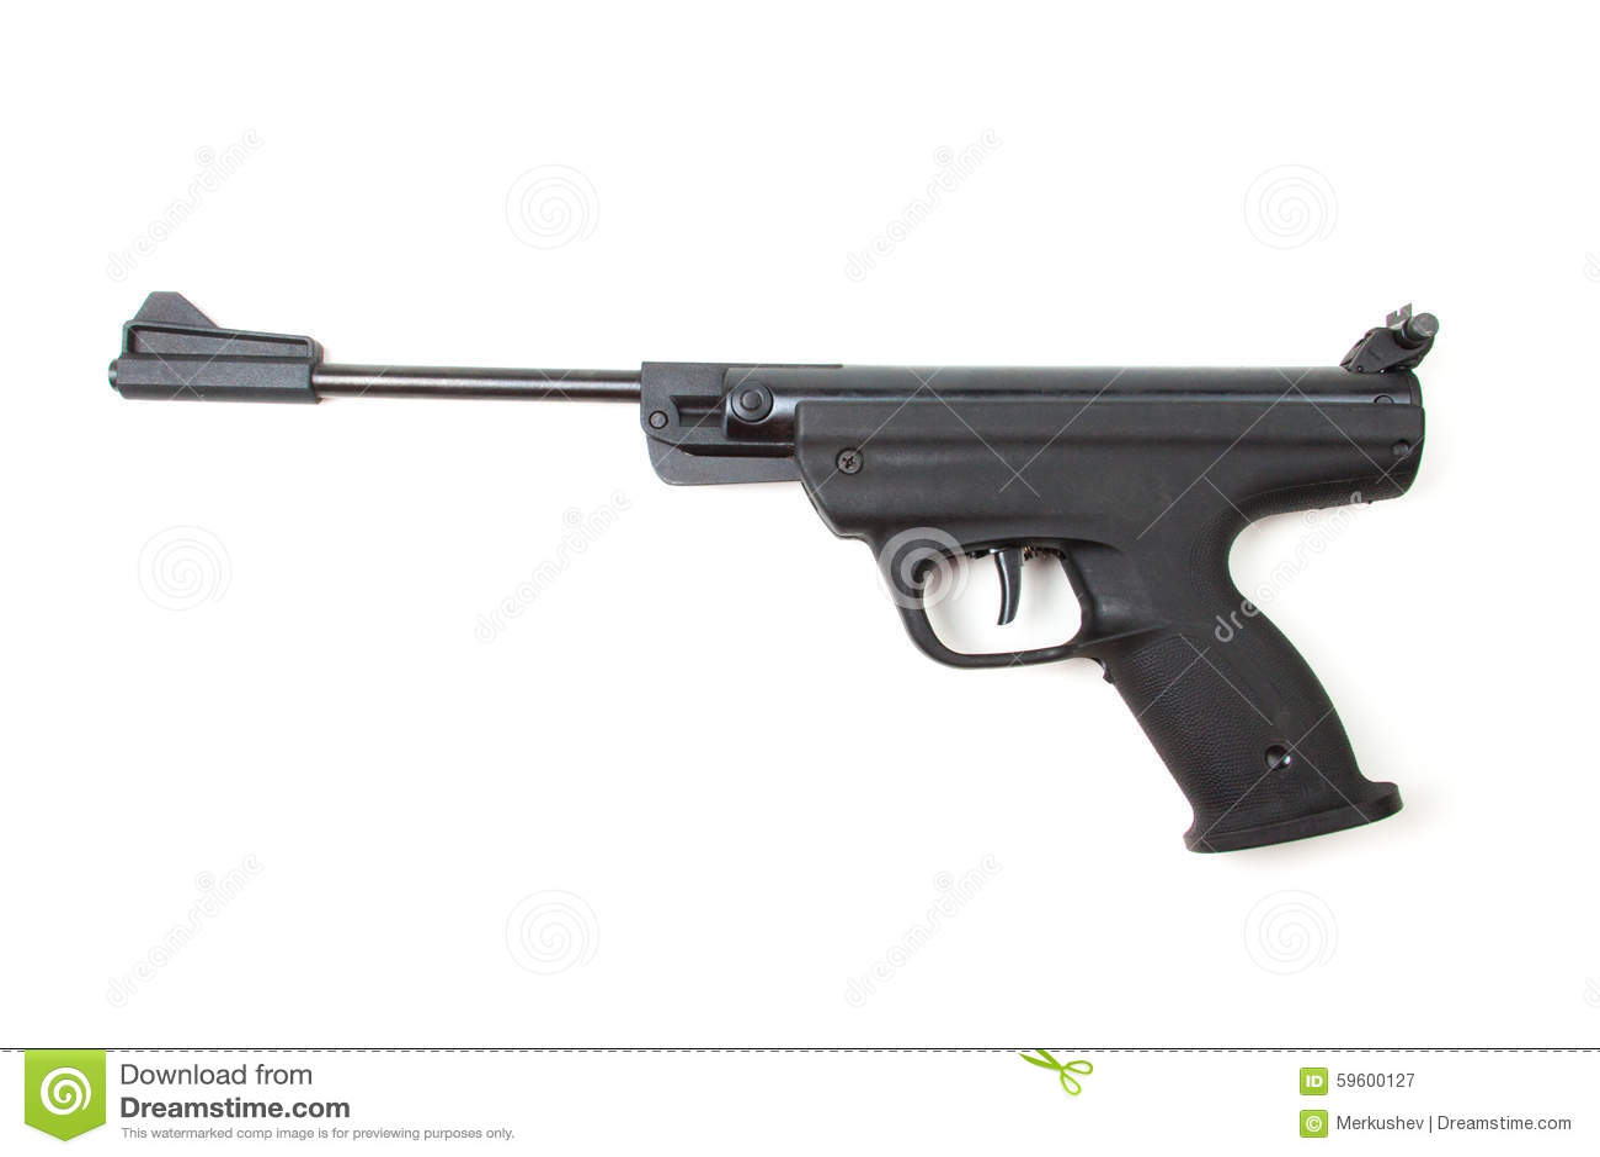 gun white background - photo #25